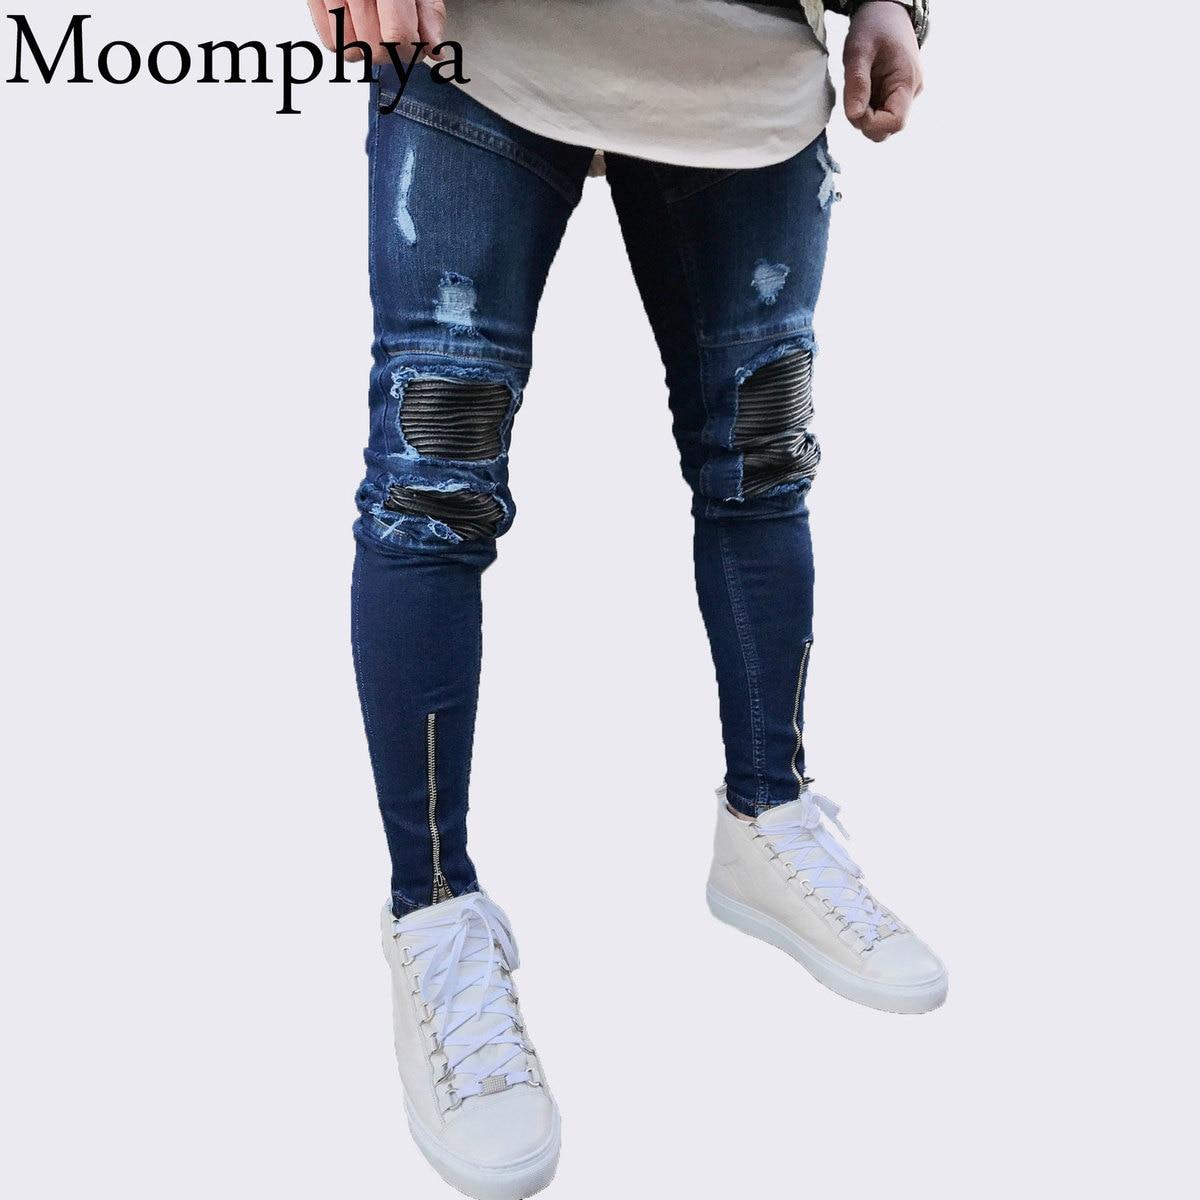 Moomphya 2018 New Brand Design Men zipper jeans